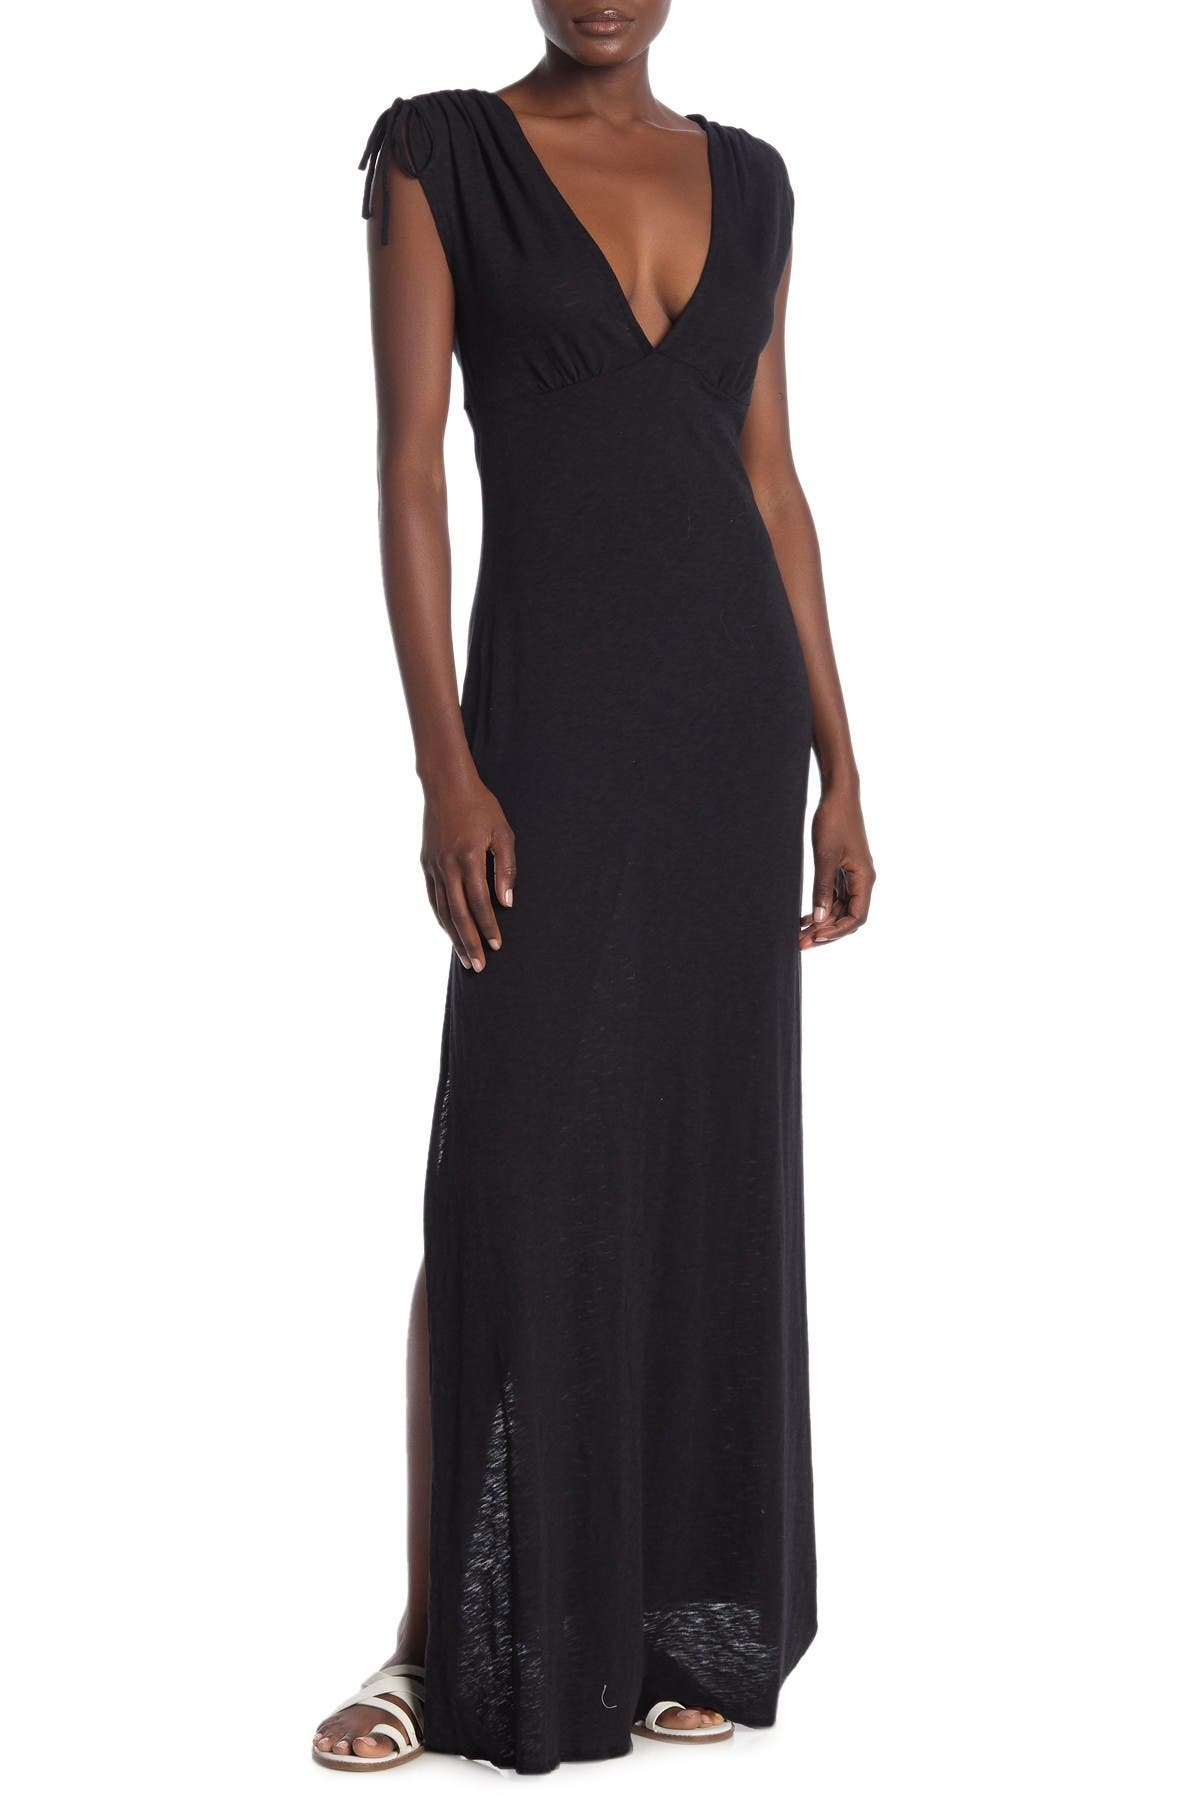 Image of Vitamin A Selma Tie Strap Cover-Up Maxi Dress